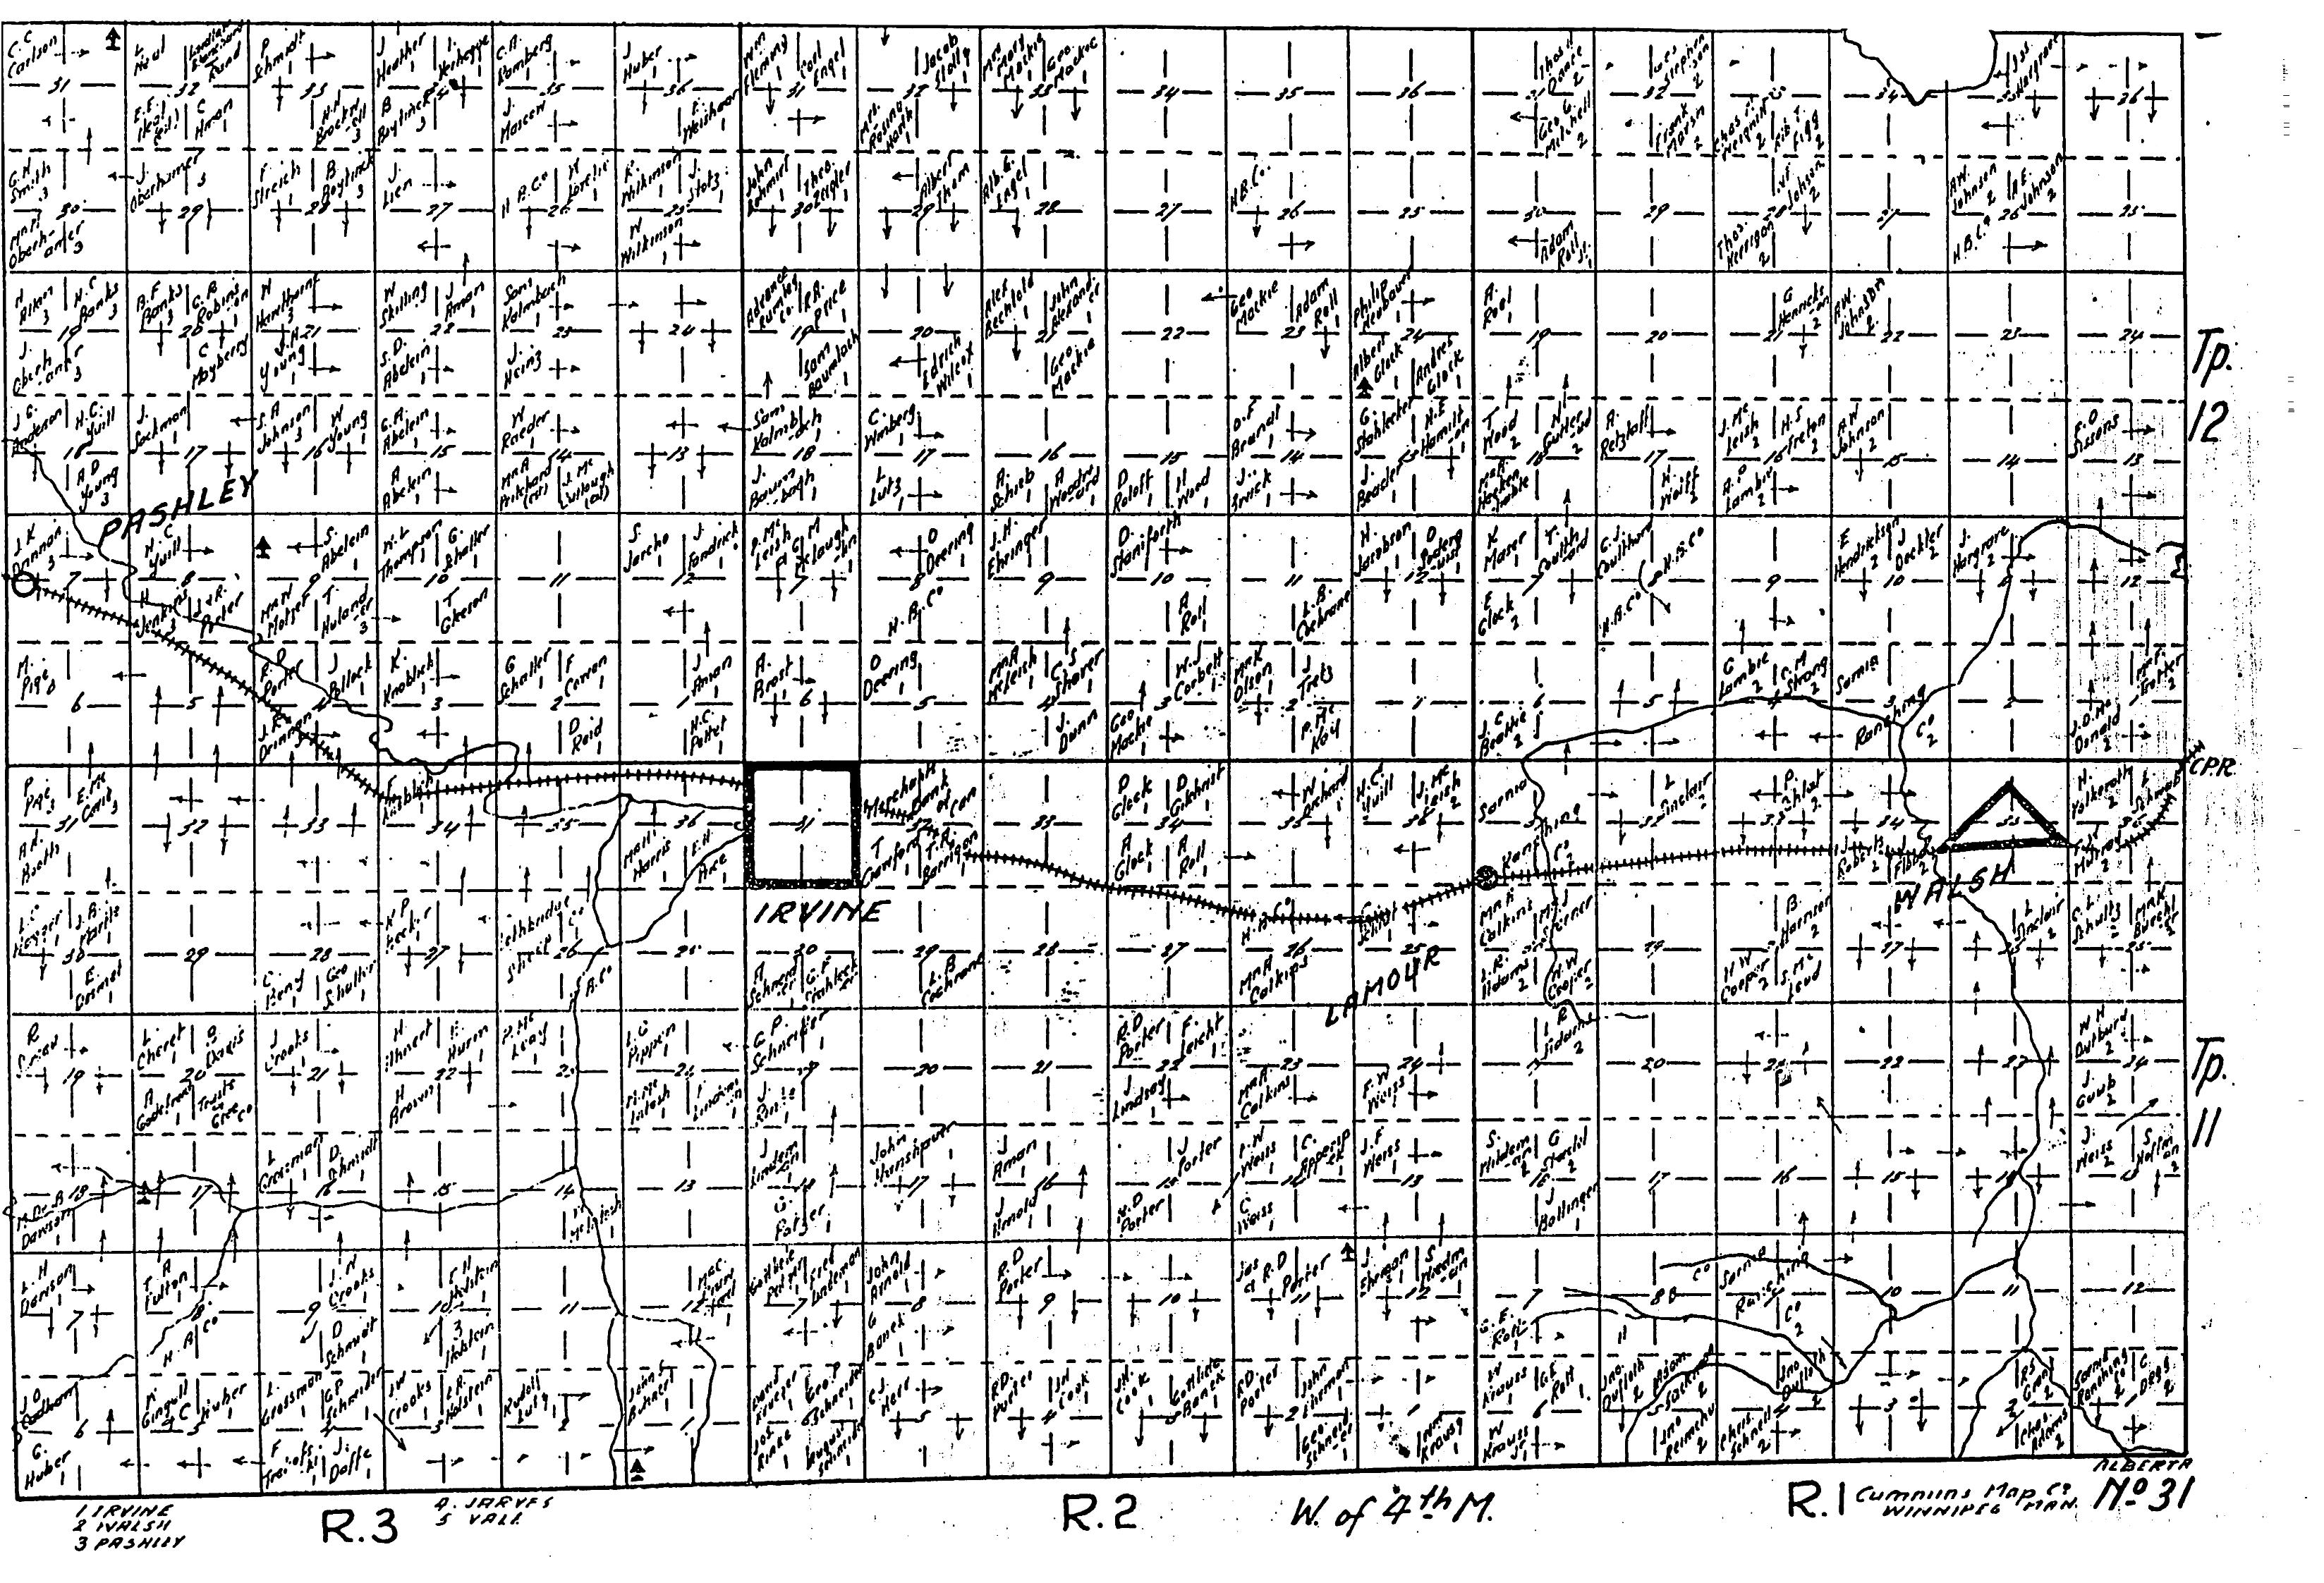 FileAlbertaHomesteadMap1918 t1112 r13 map31png Wikipedia